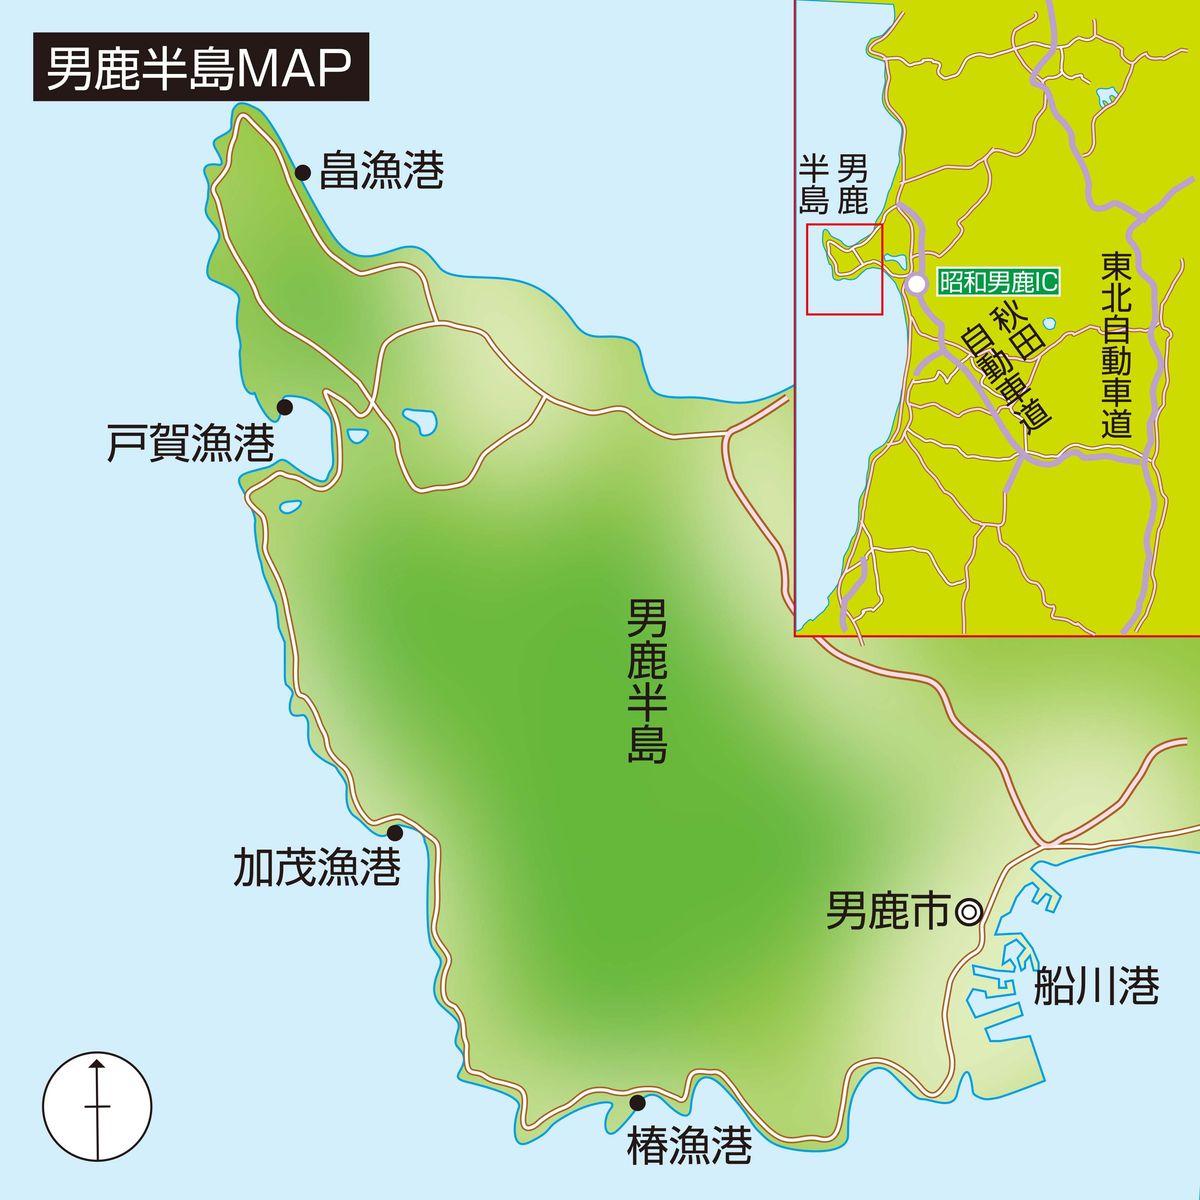 078-101_zenkokutsuribaGW06_cs6 (8)